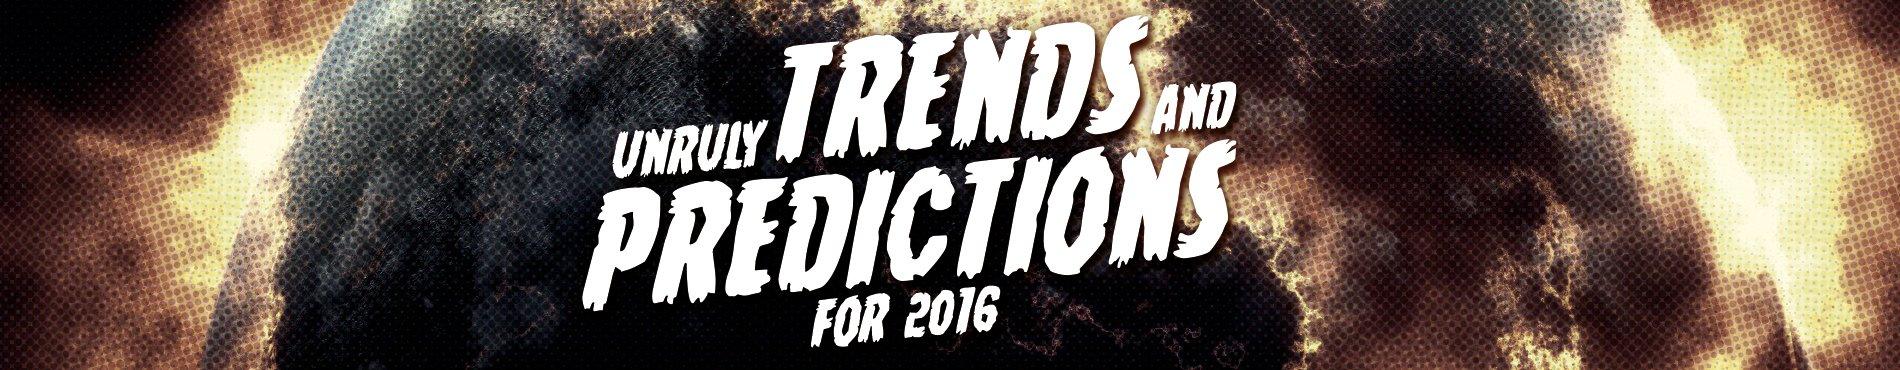 Download our report for the top 10 social video trends for 2016 https://t.co/MZFgYrhNLZ https://t.co/BUGIKBtrJk